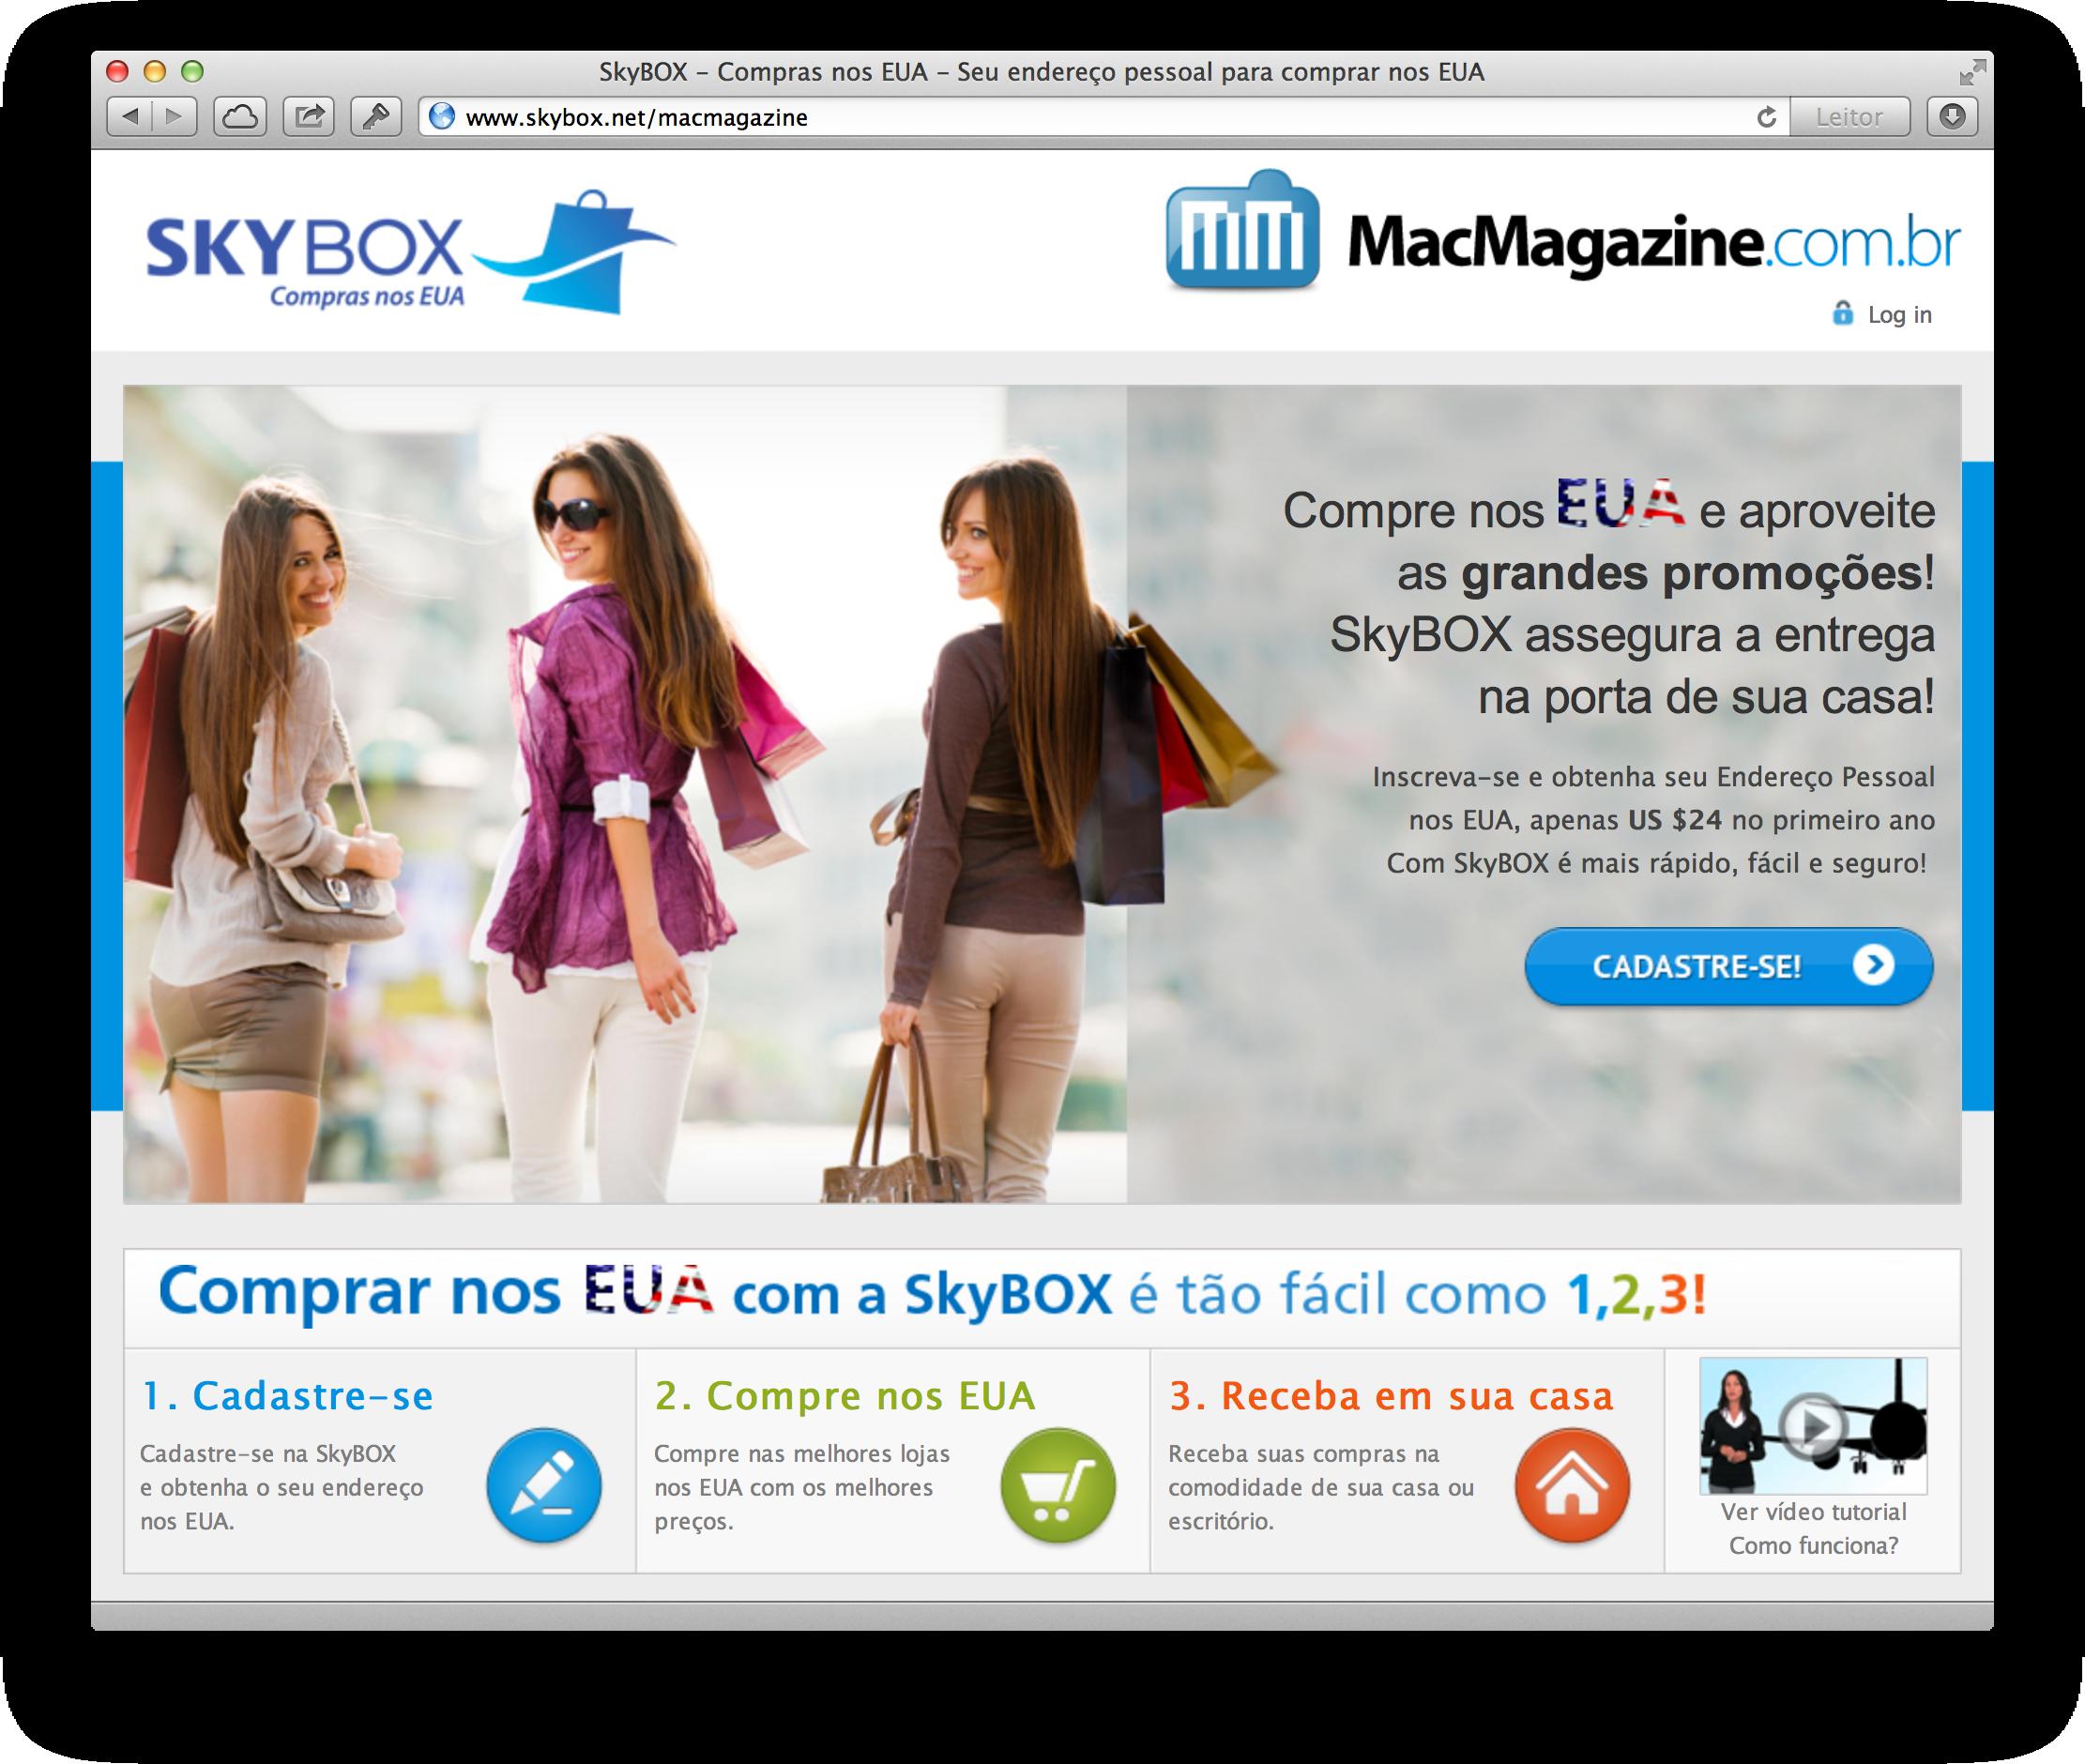 SkyBOX e MacMagazine no Safari